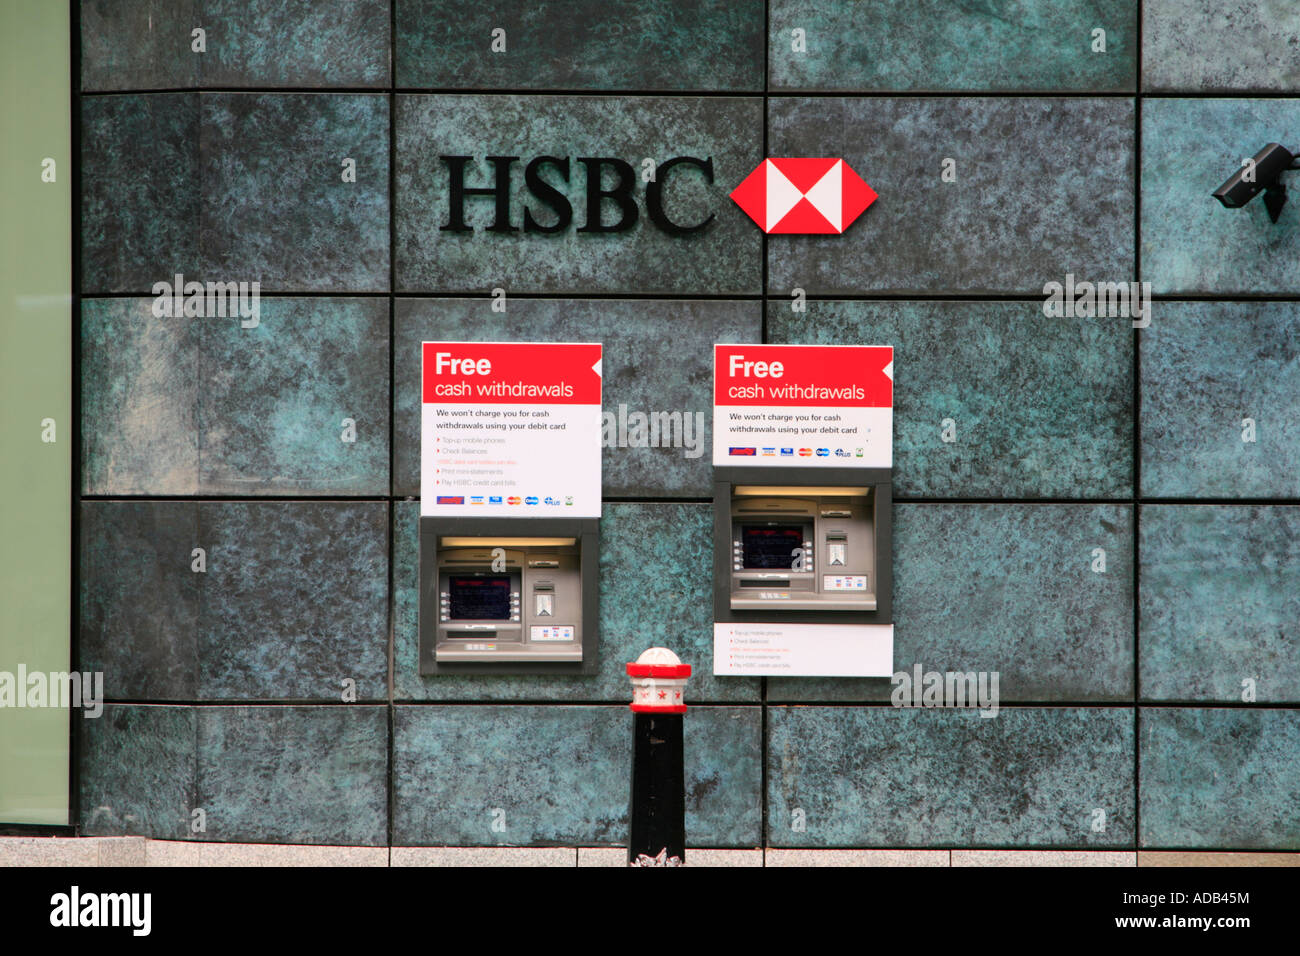 free cash withdrawal machine city of london hsbc bank england uk gb